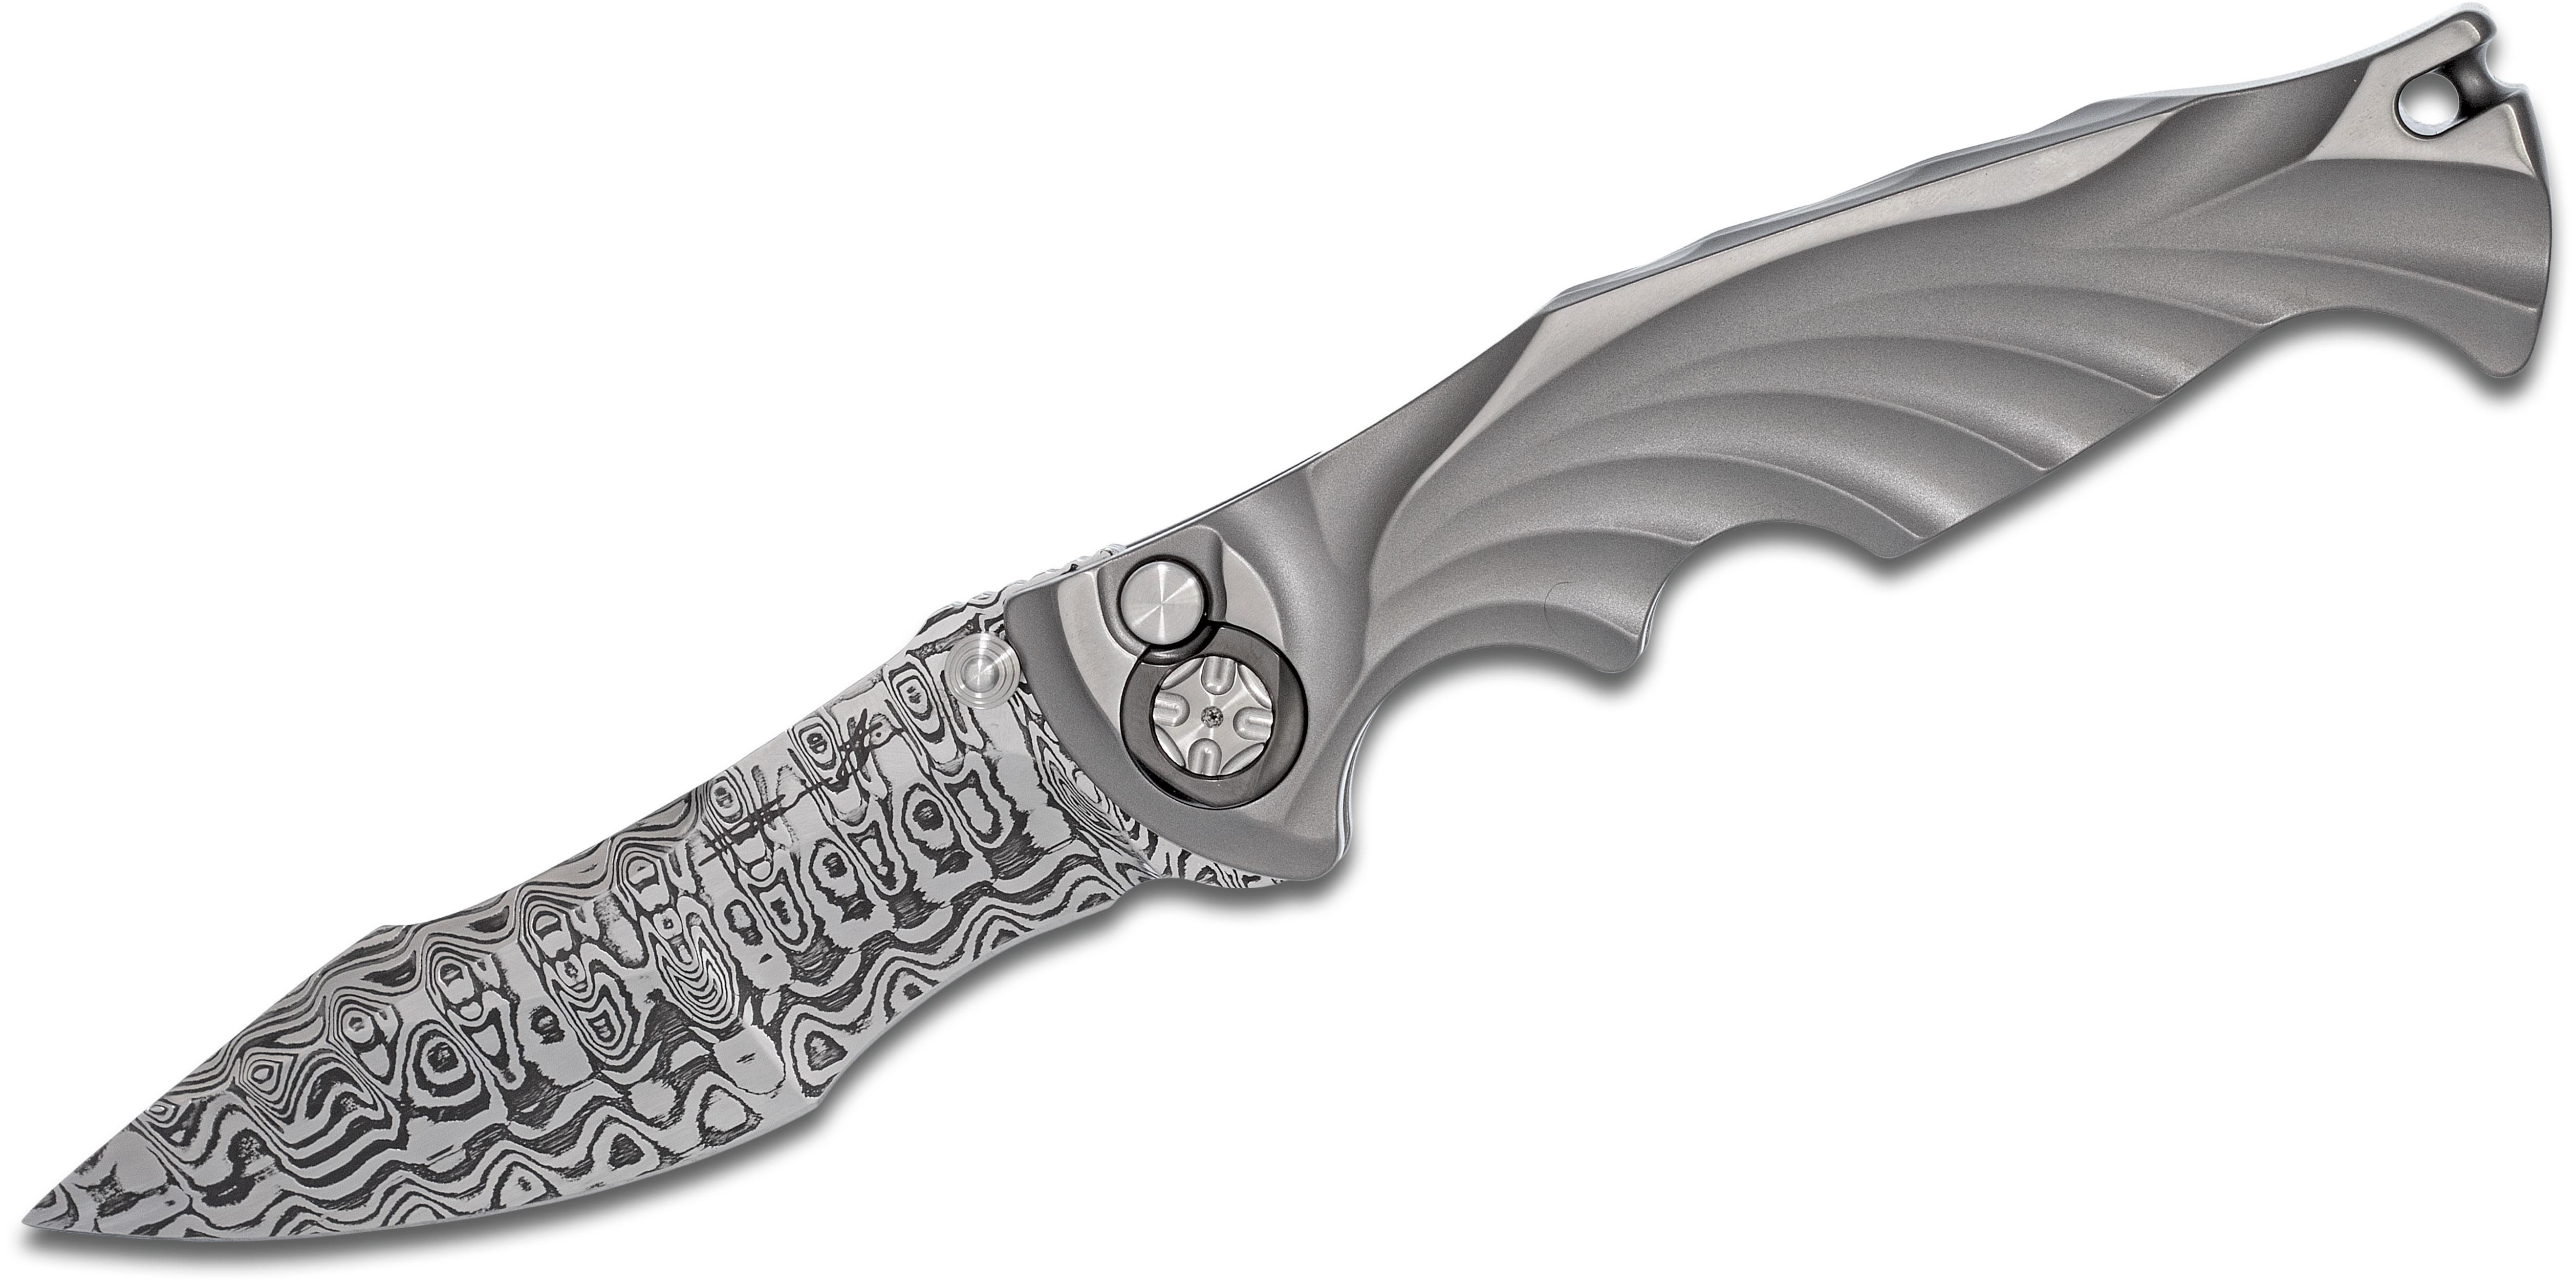 Brian Tighe Custom Integral Breaker Automatic 3.875 inch Damasteel Recurve Blade, Single Piece Titanium Handle, Zirconium Collars and Clip